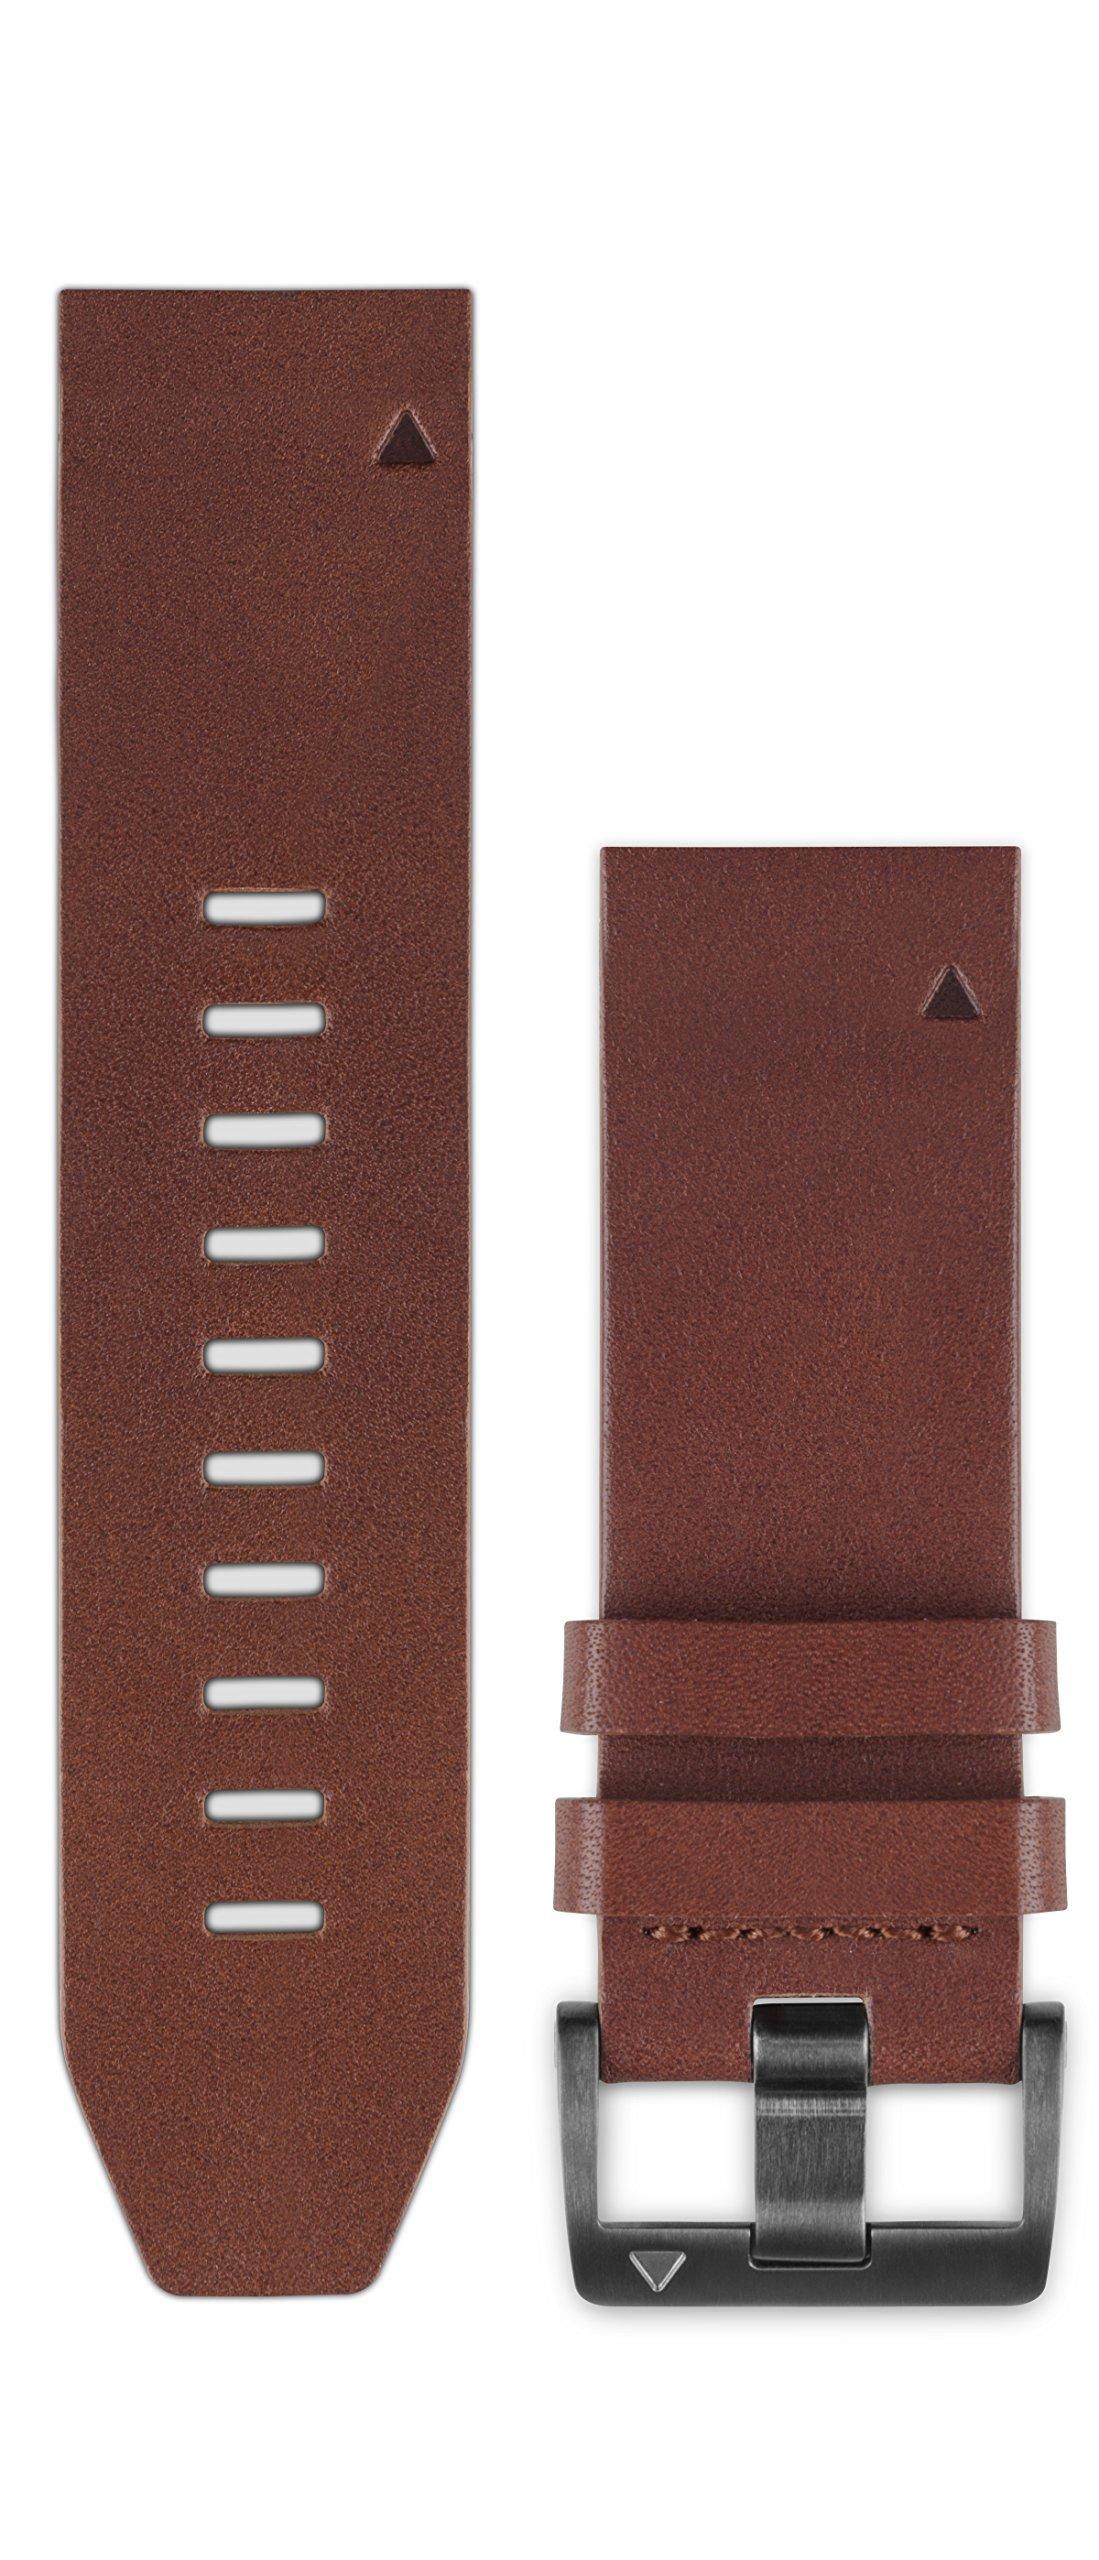 Garmin 010-12496-05 Fenix 5 Quick fit 22 Watch Band - Brown Leather by Garmin